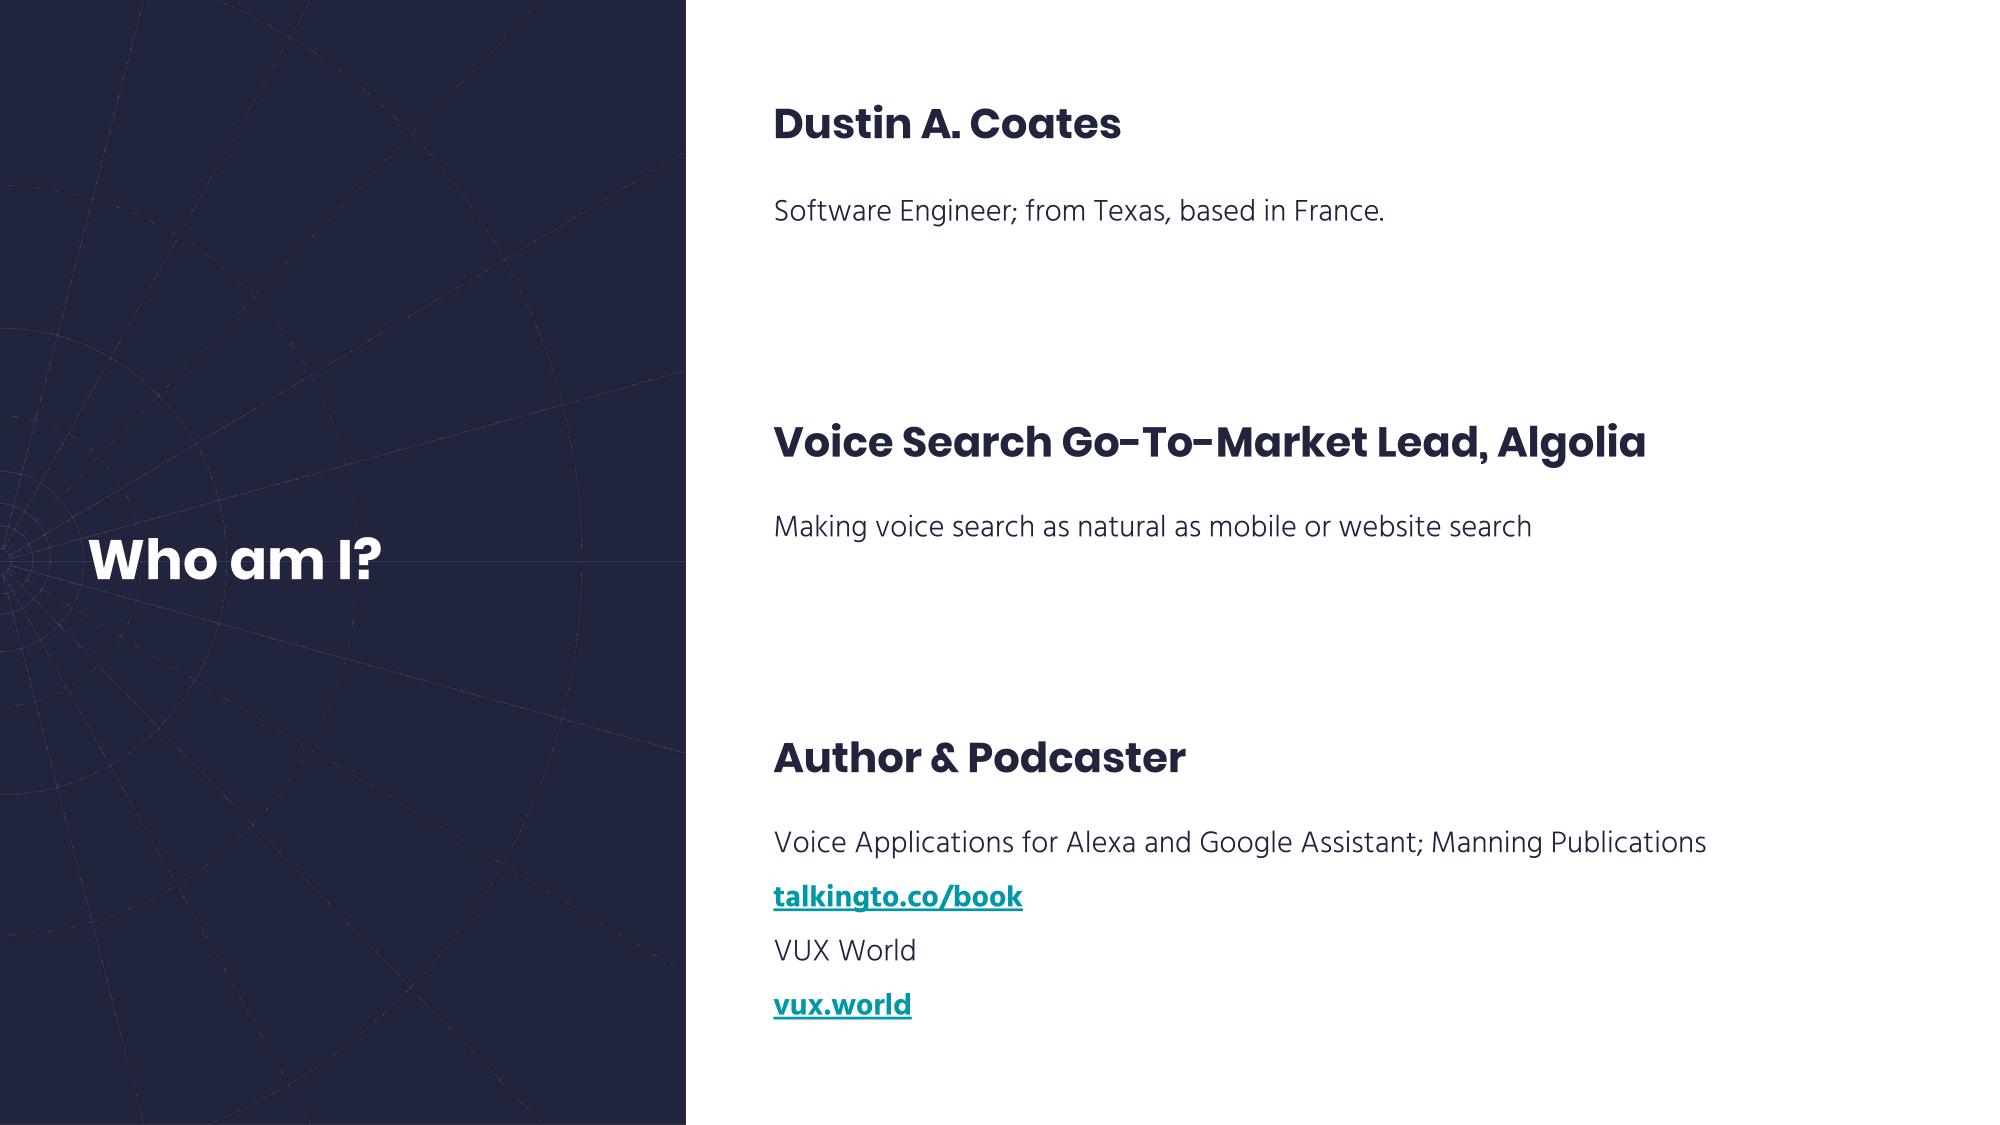 Dustin Coates, Voice Search at Algolia